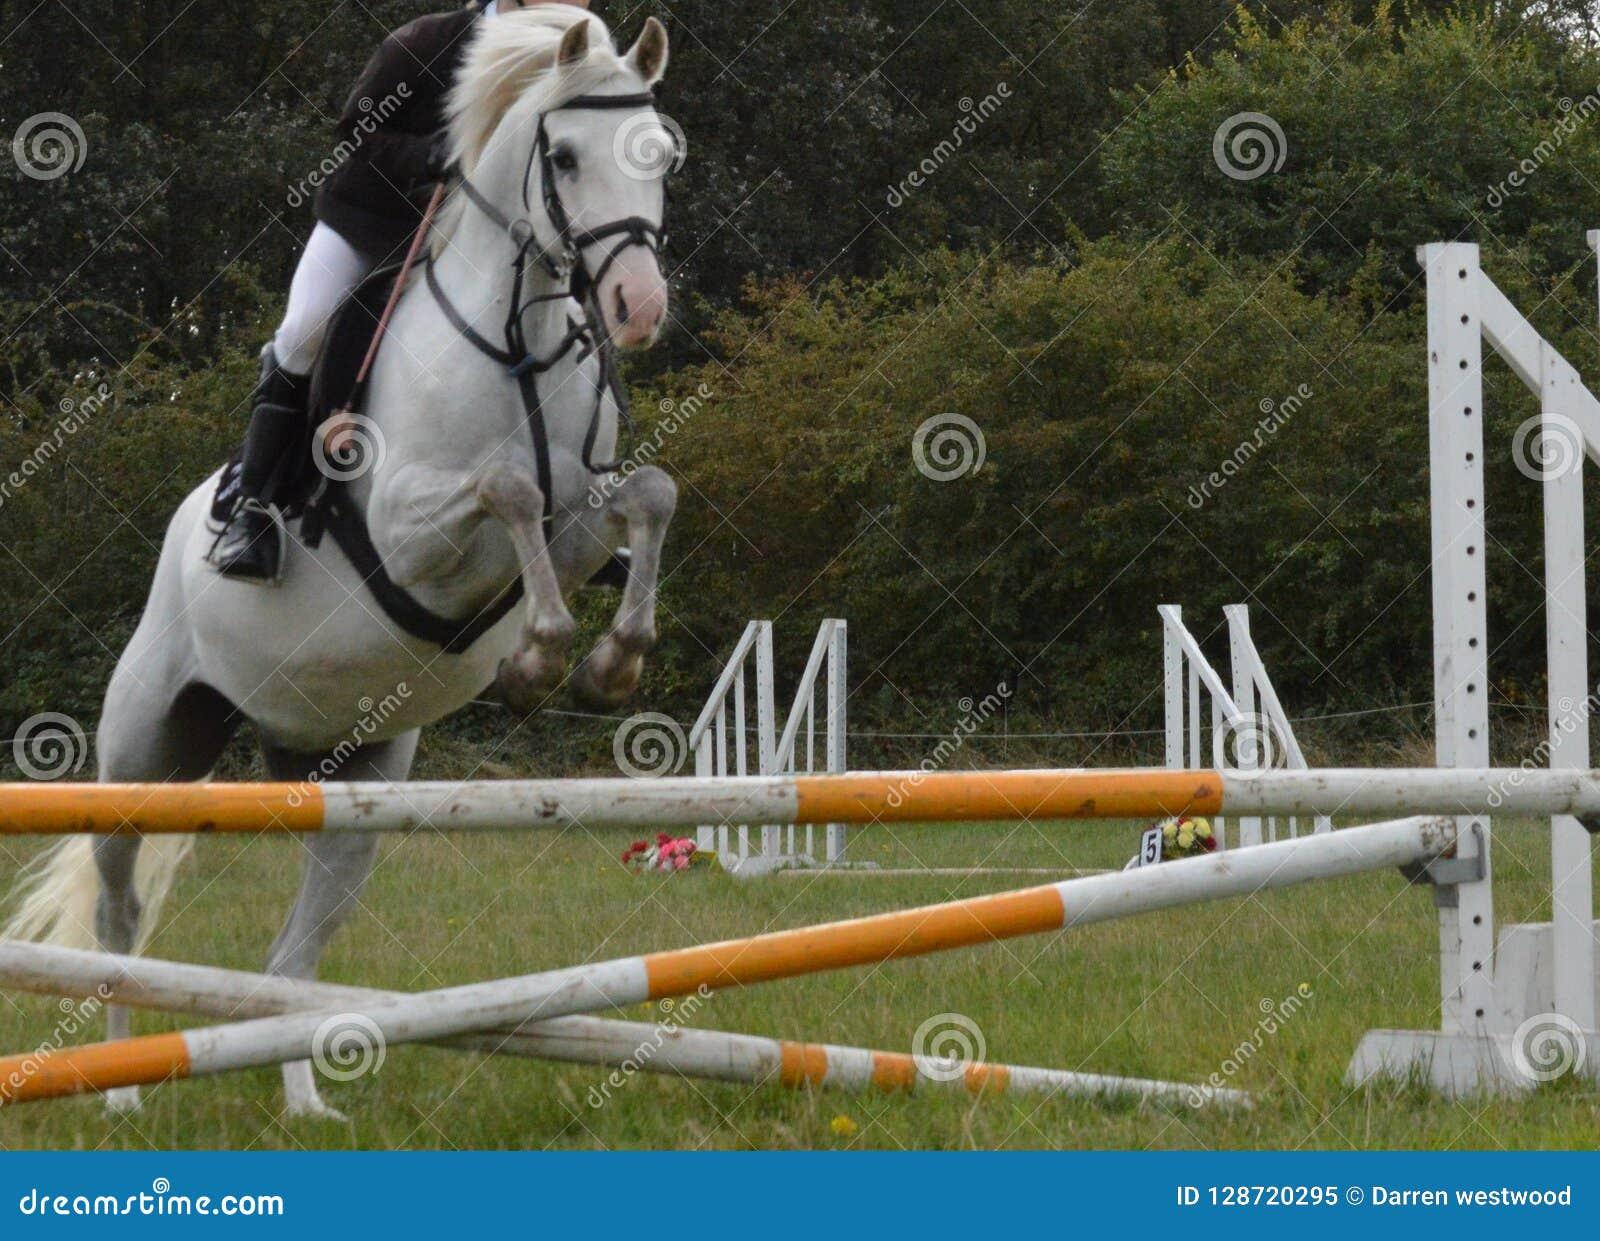 Horse And Rider Jumping A Hurdle Stock Image Image Of Active Saddle 128720295